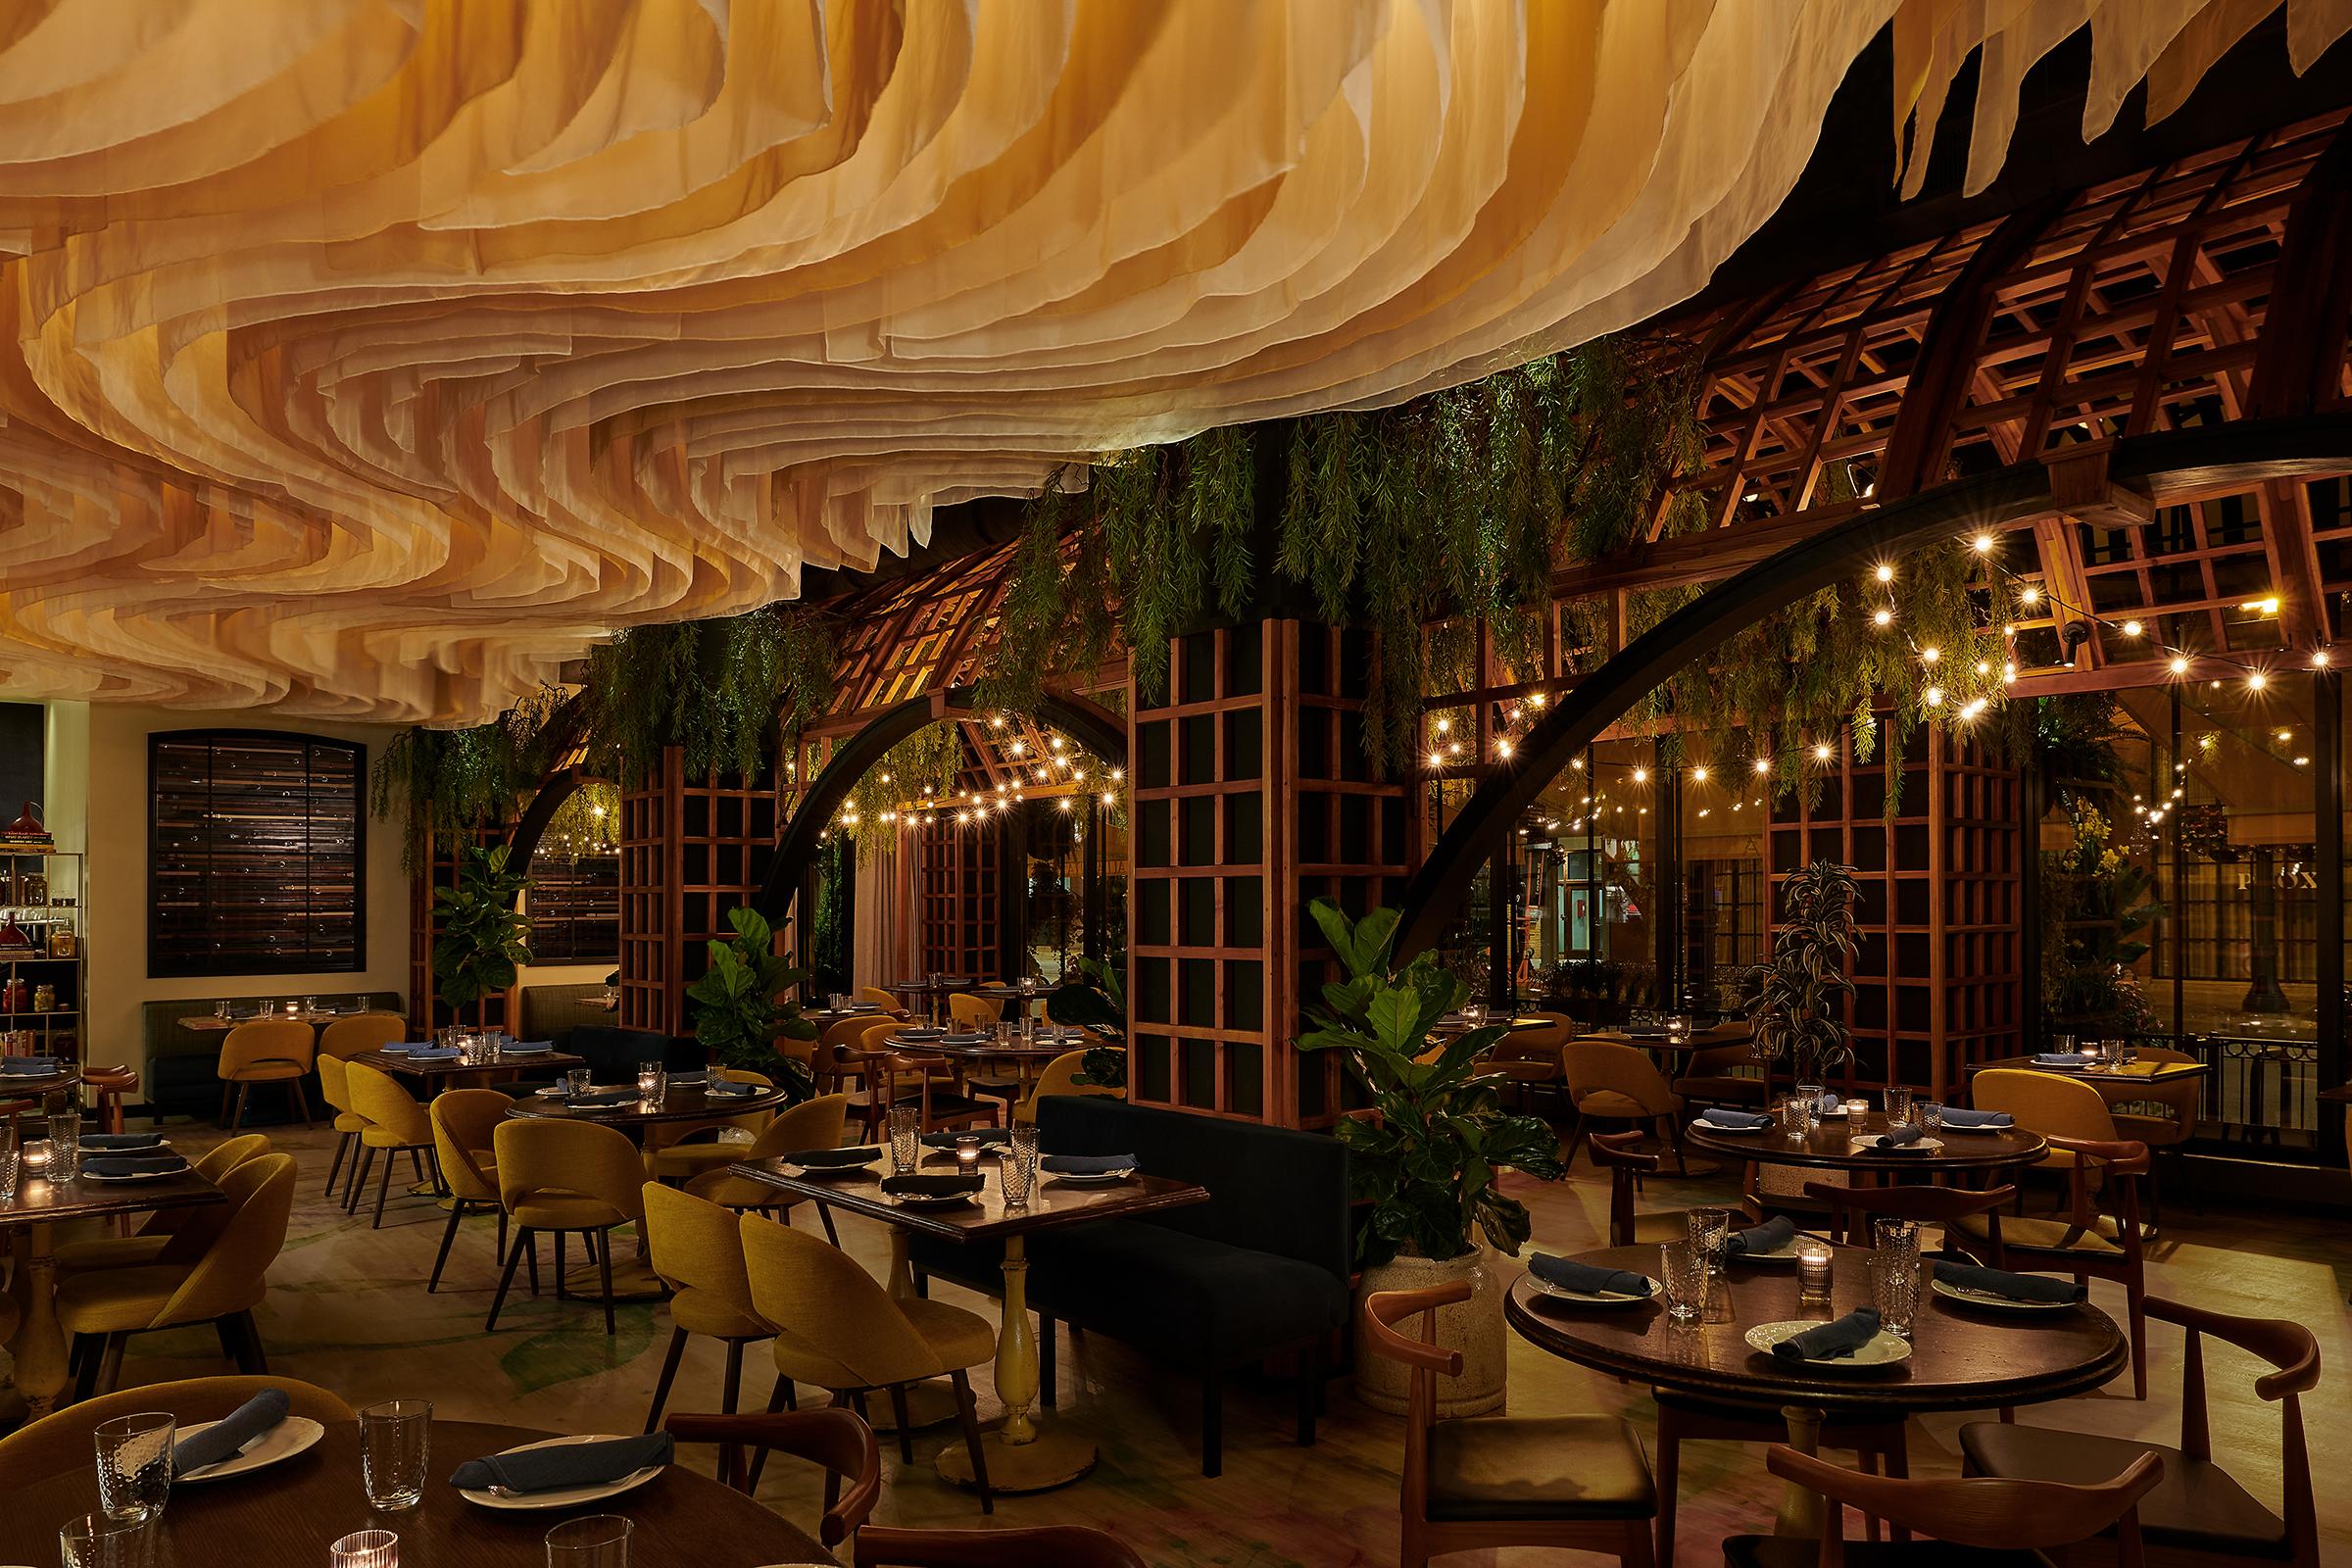 The dining room at All Vita